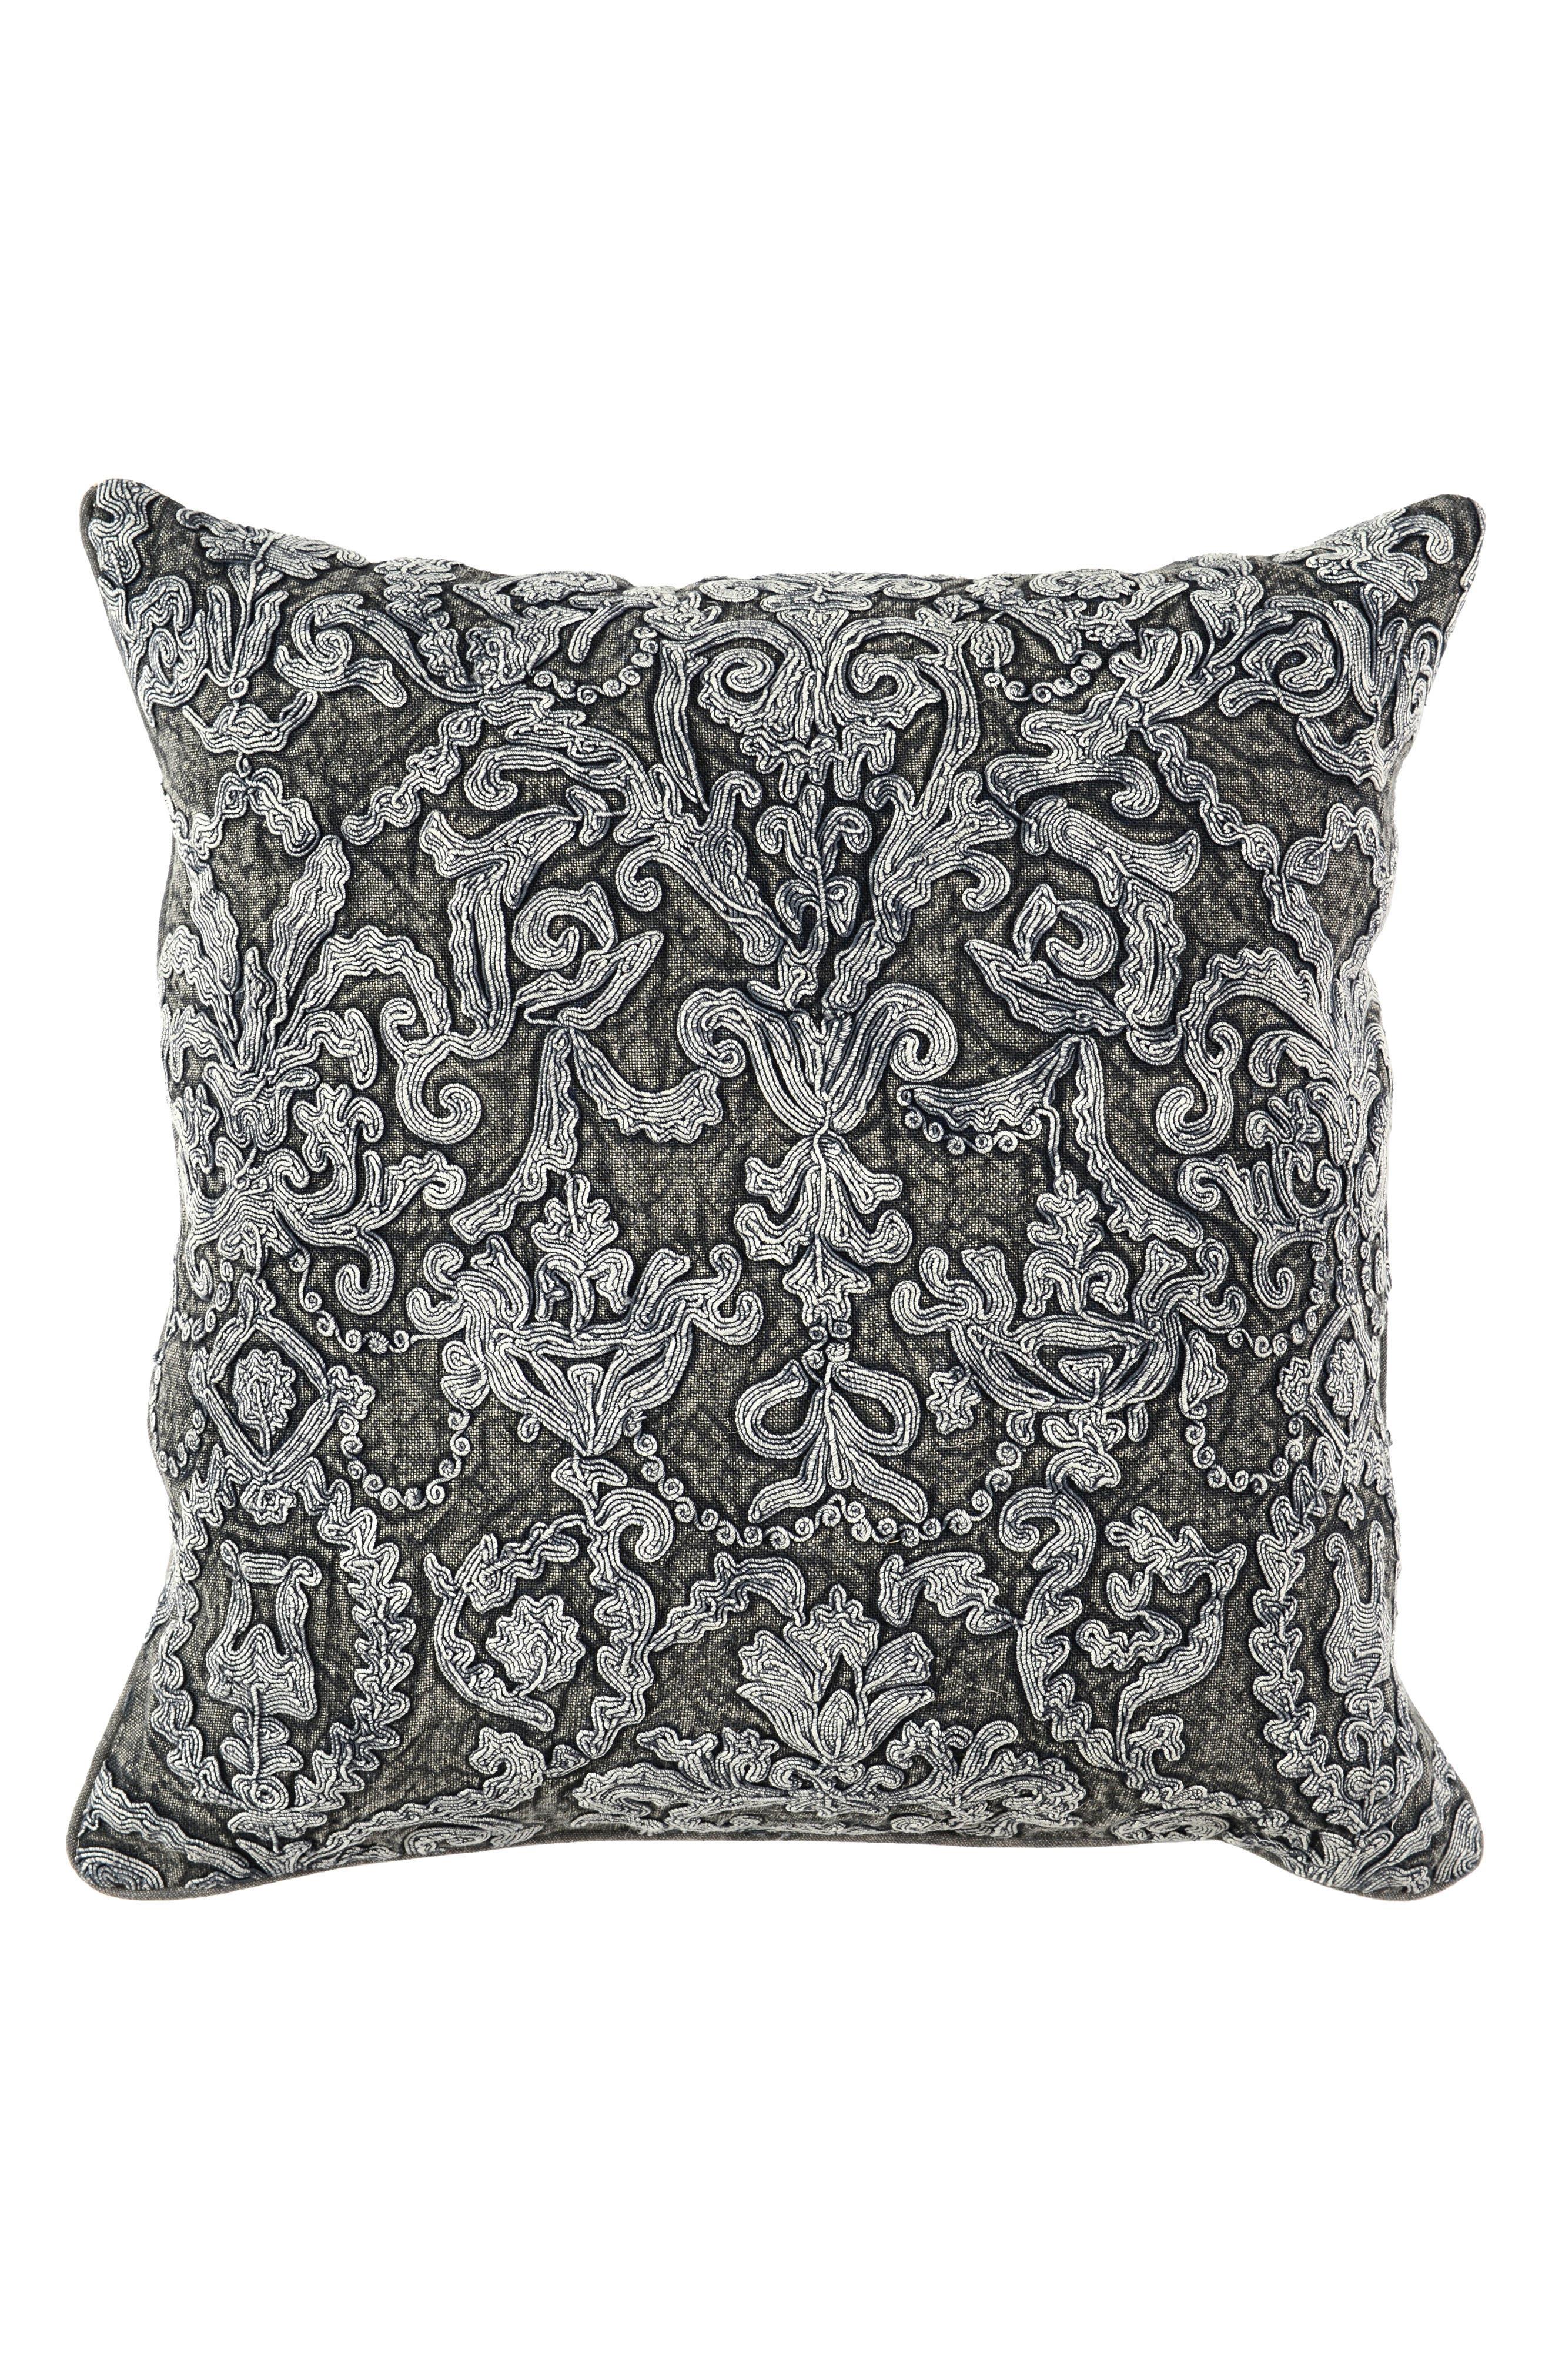 Empress Linen Accent Pillow,                         Main,                         color, CHARCOAL